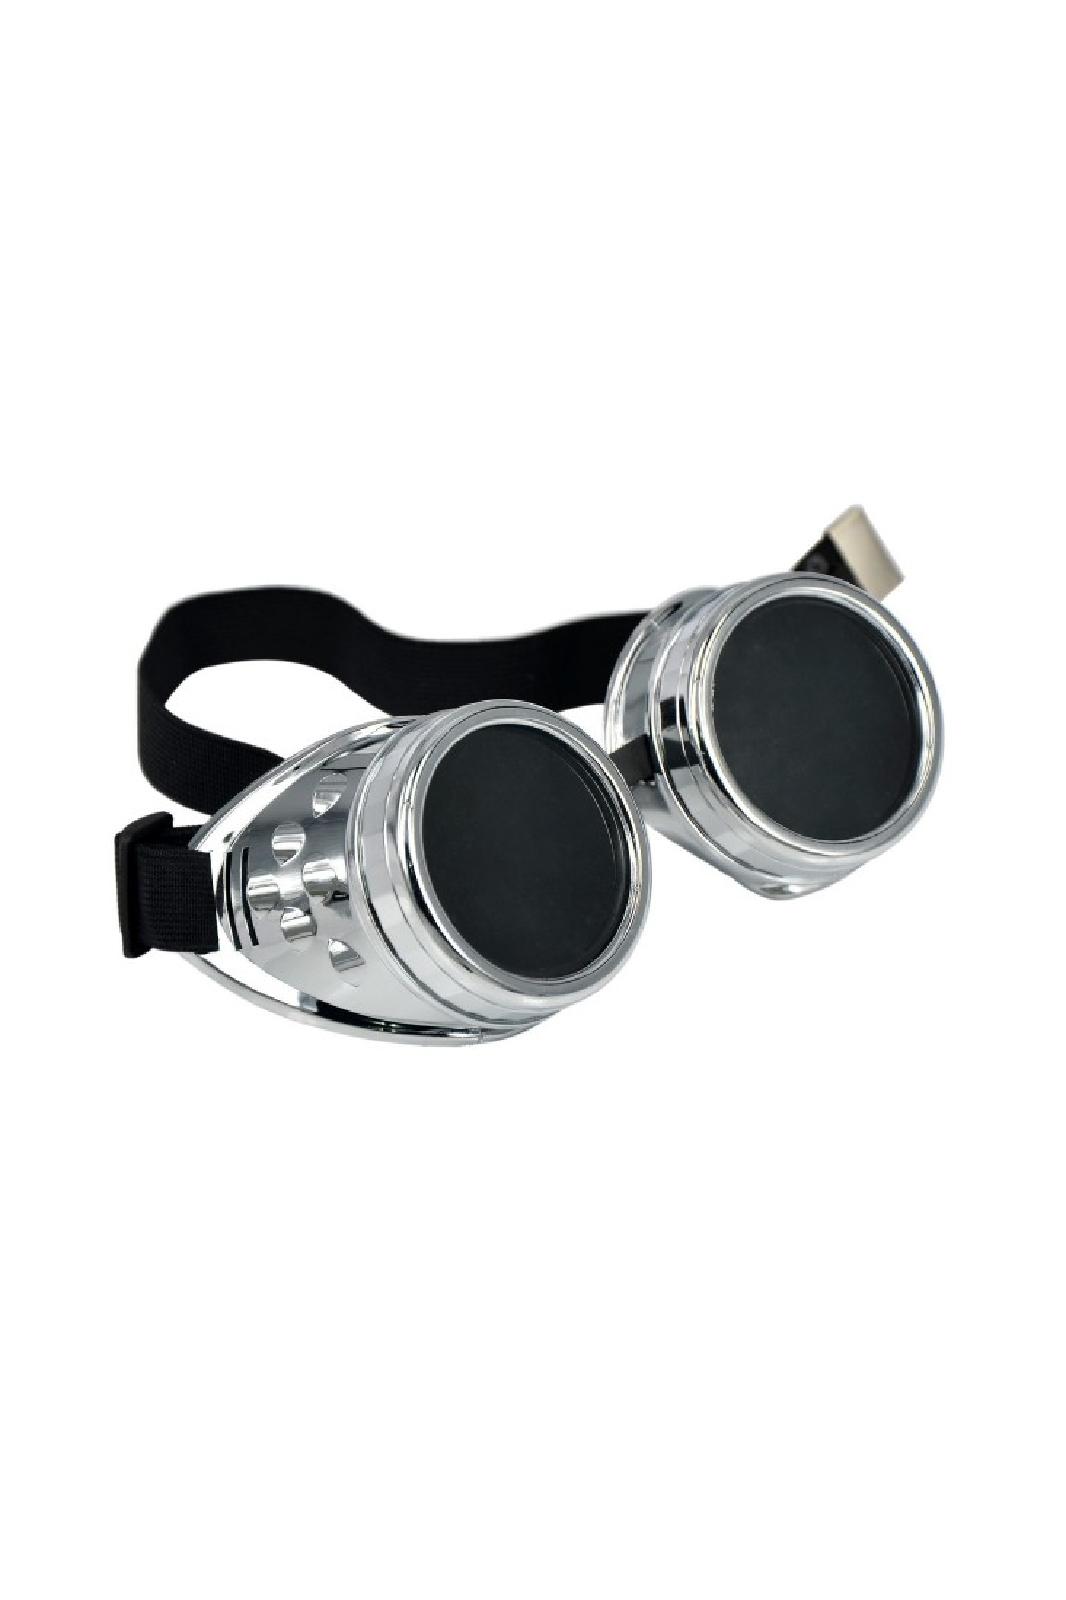 Sp Goggles Rivet Crome Black Lens